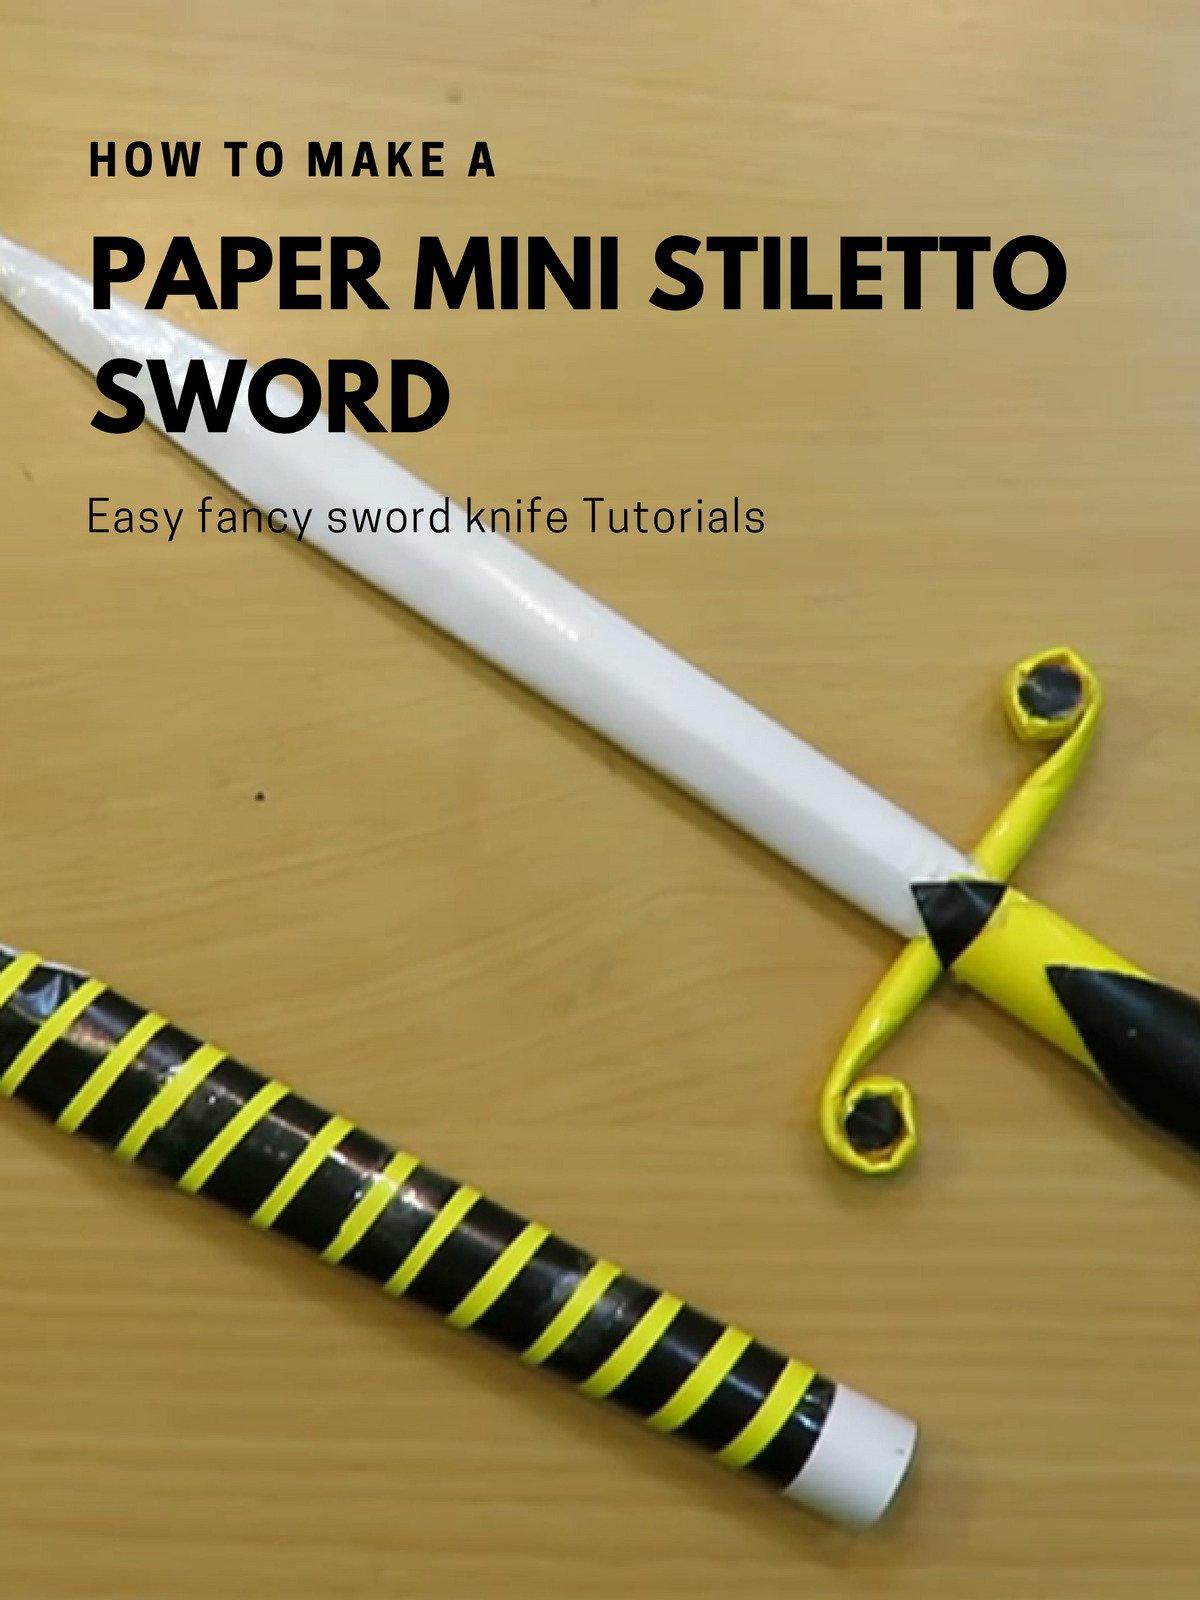 How to make a paper Mini Stiletto Sword - Easy fancy sword knife Tutorials